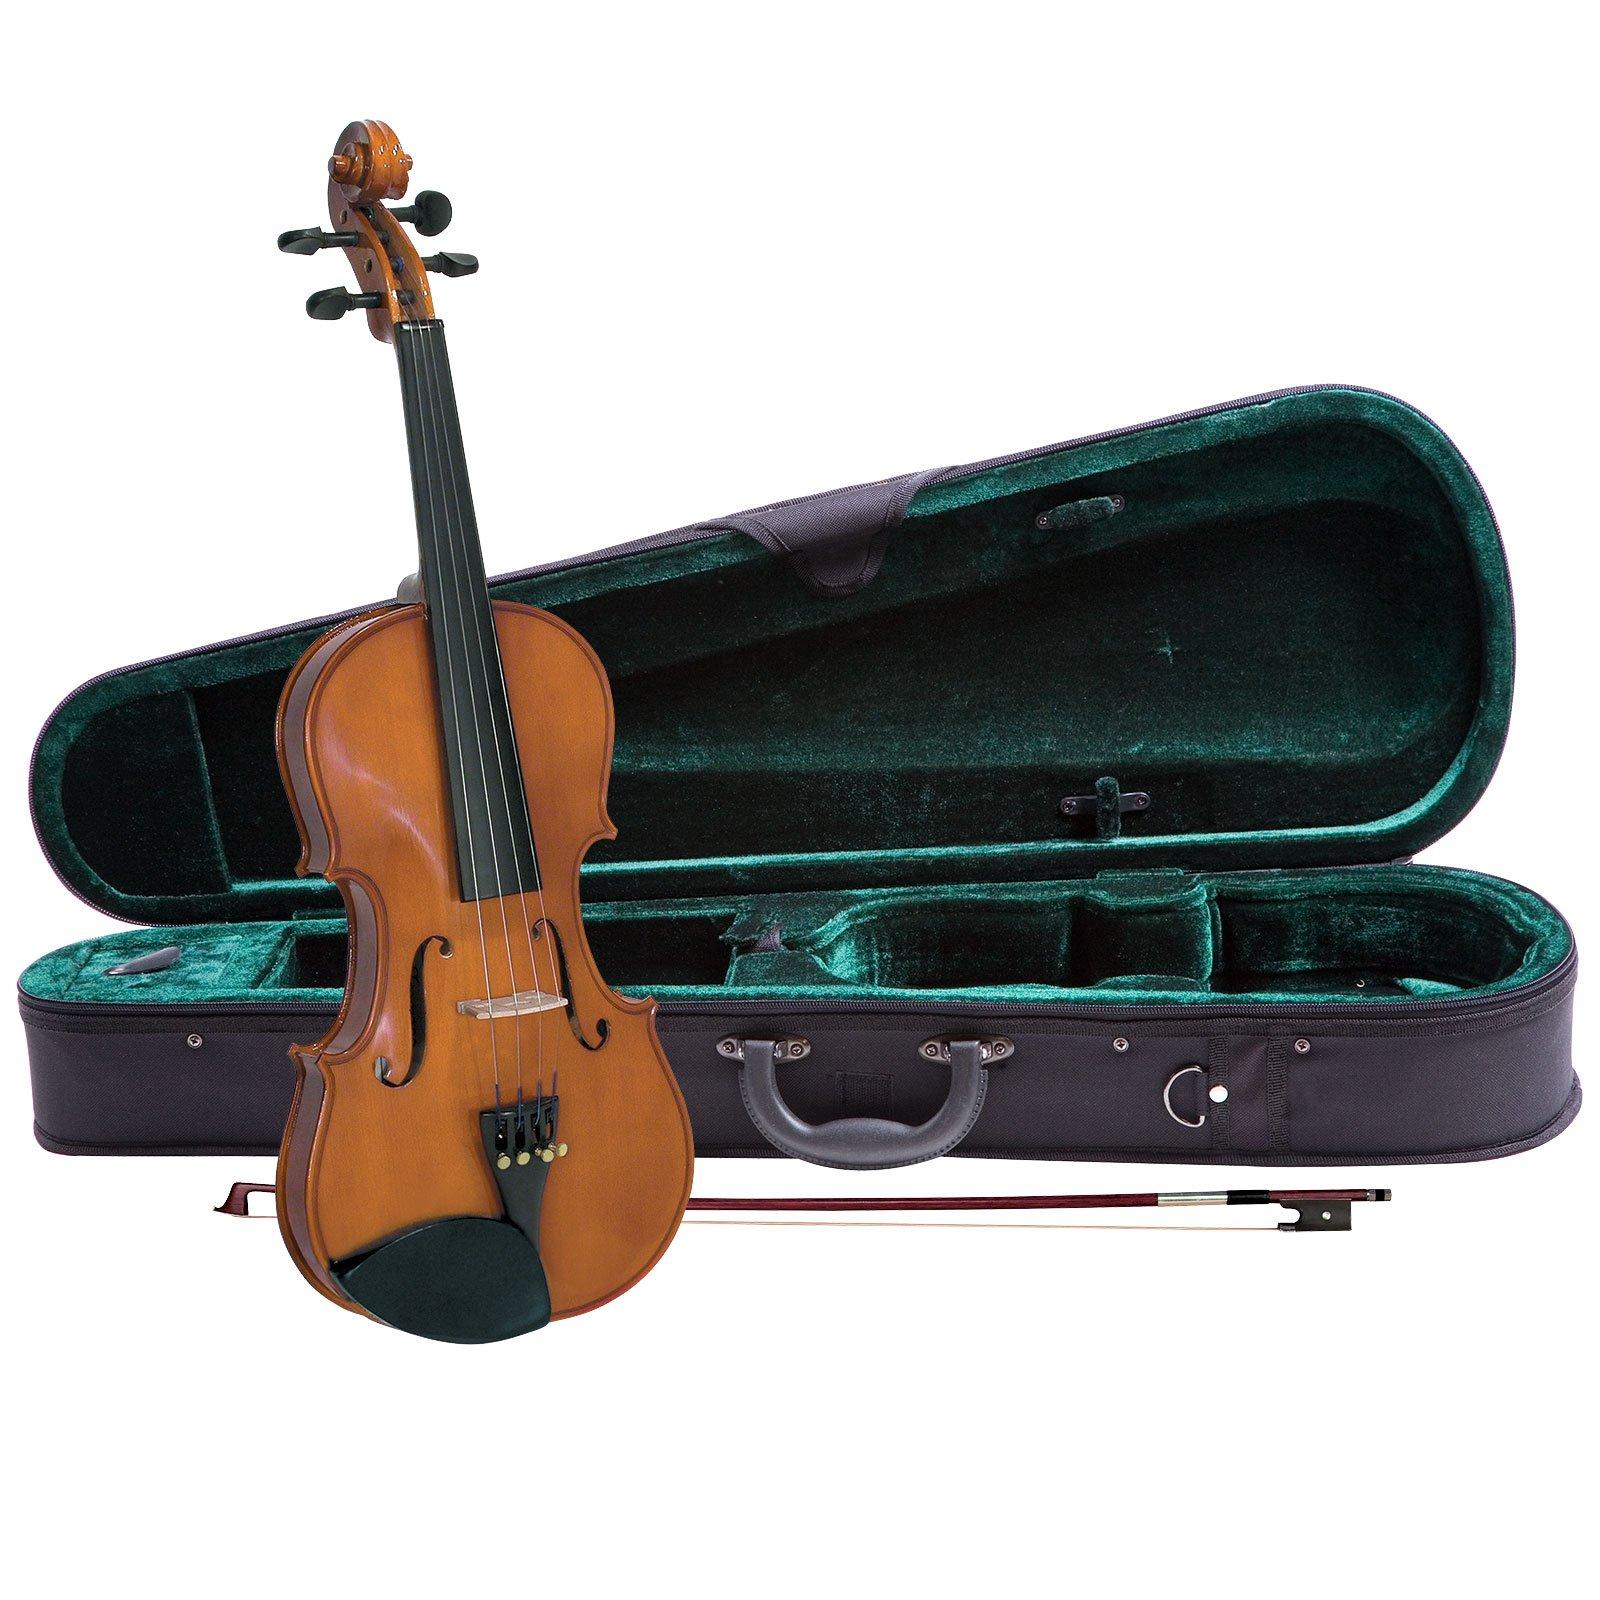 Cremona SV-75 Premier Novice Violin Outfit - 3/4 Size by Cremona